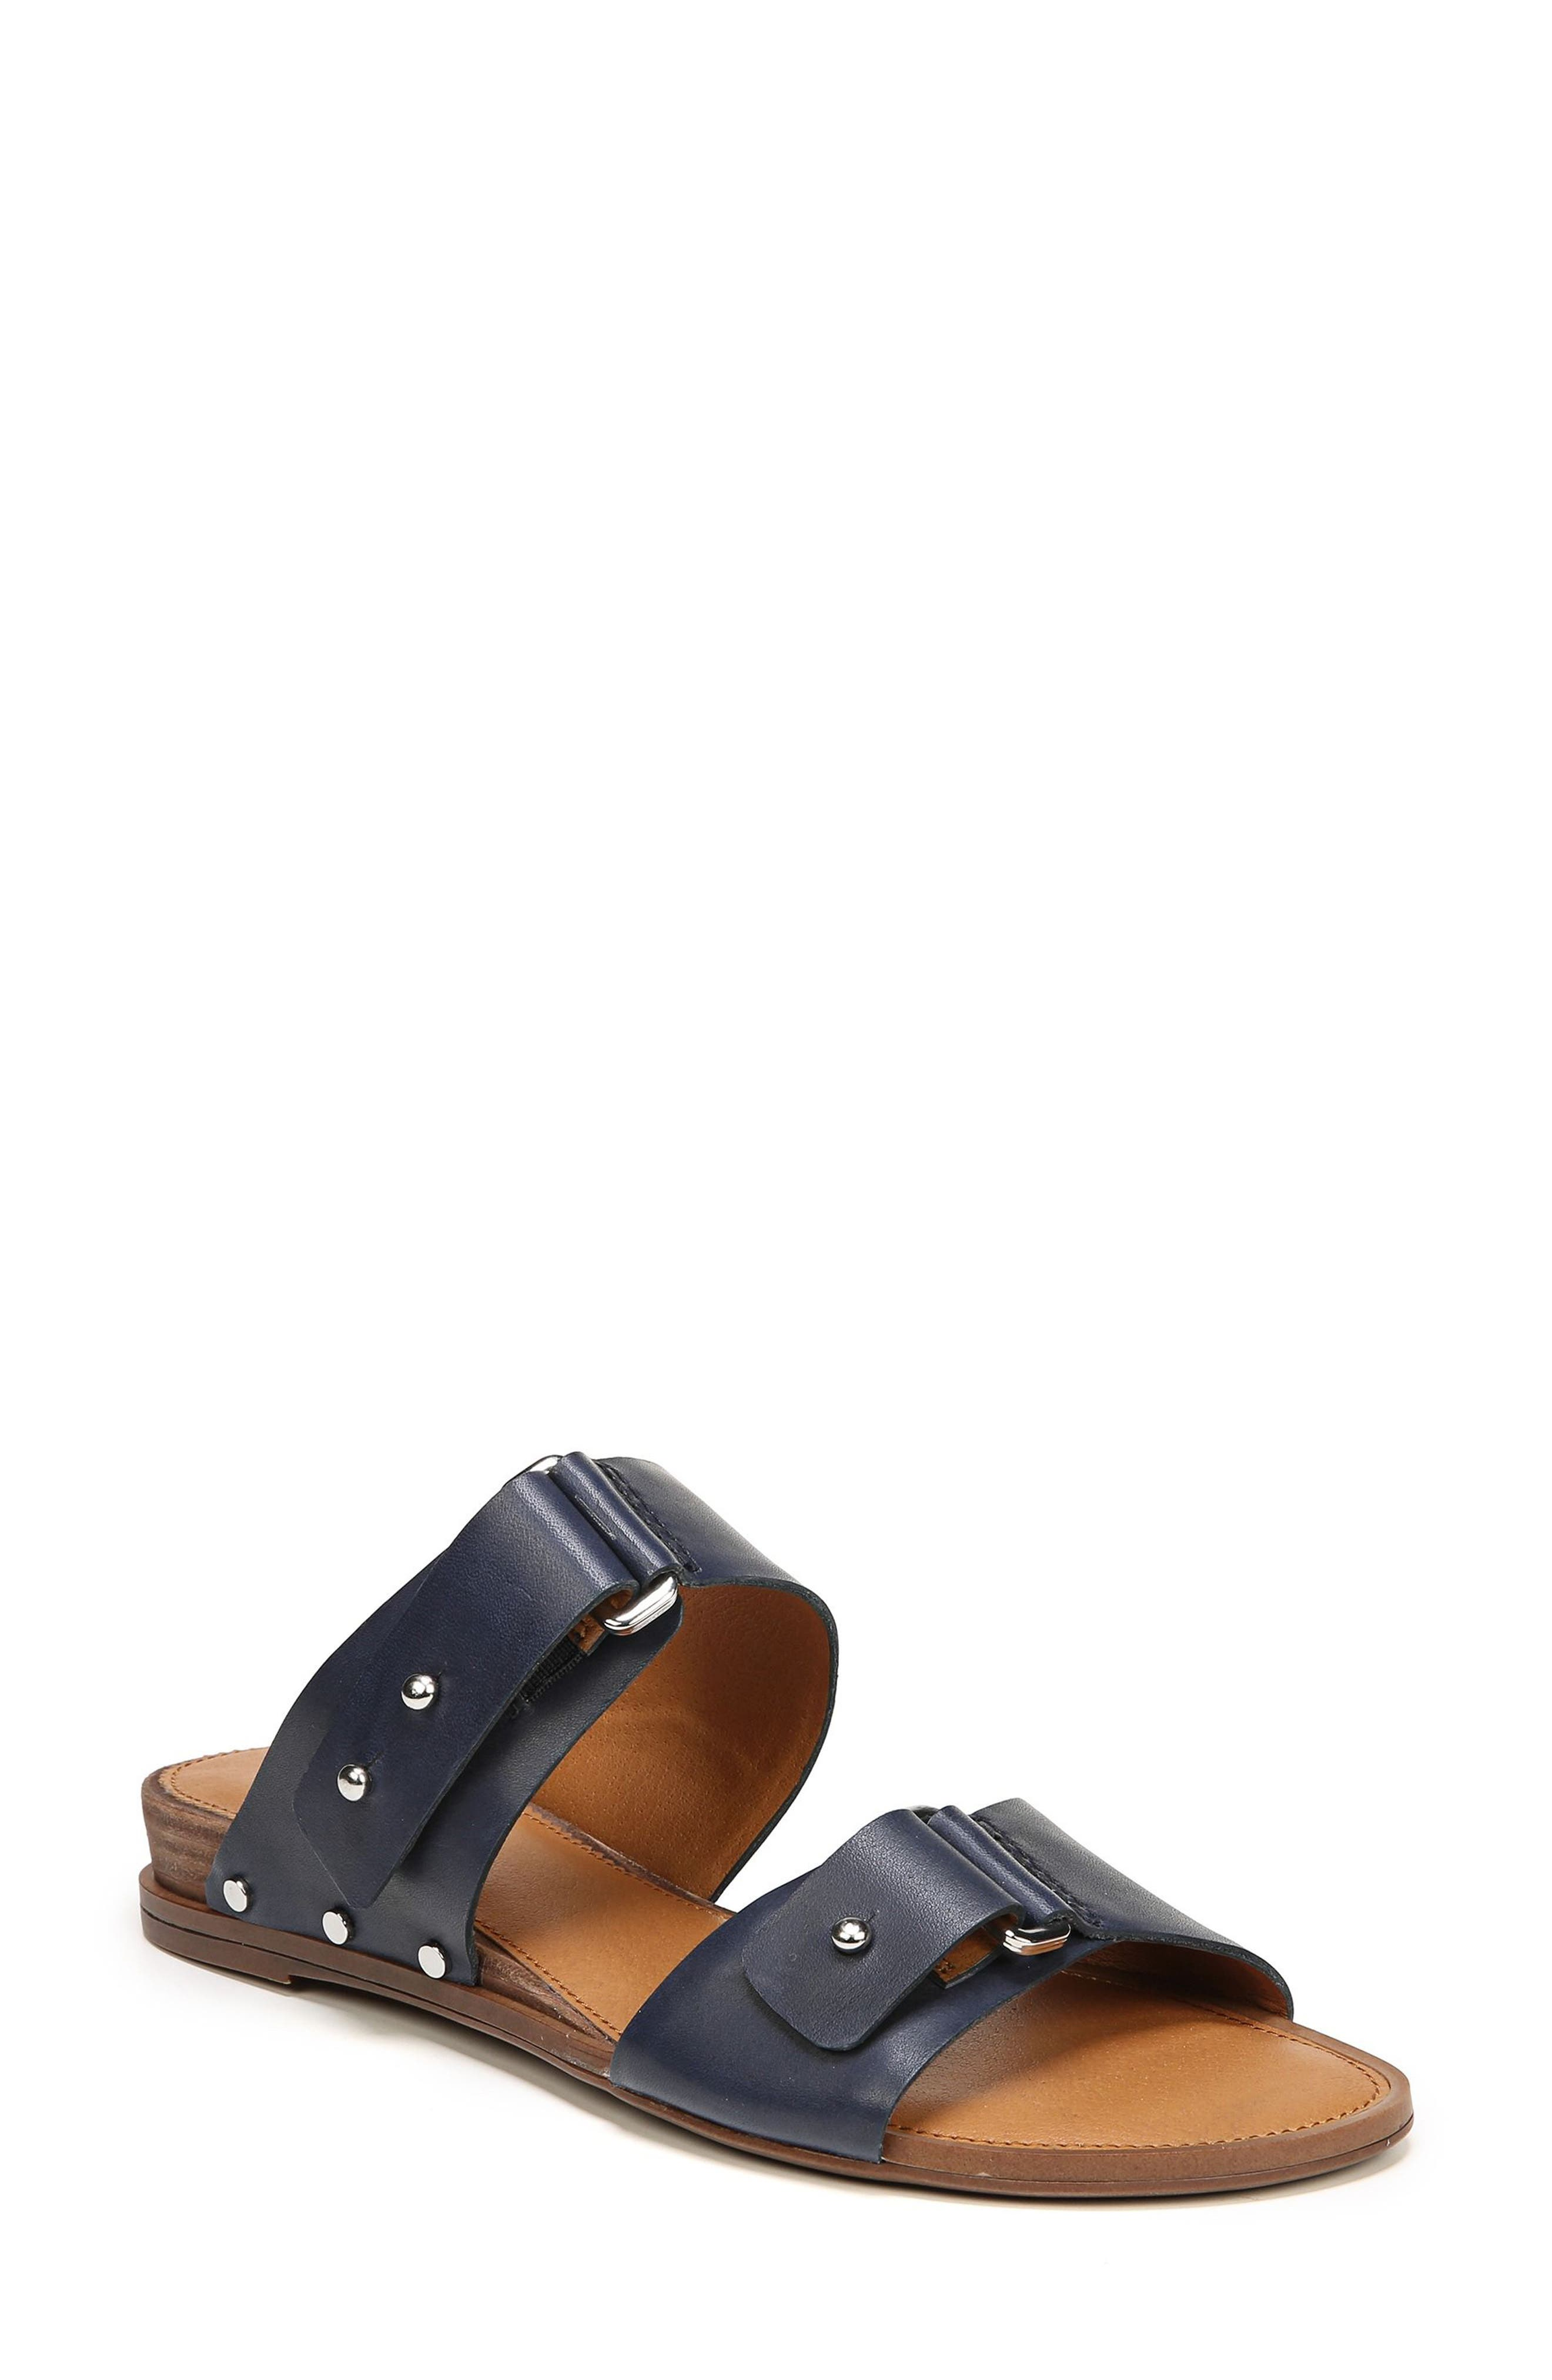 Palomino Genuine Calf Hair Sandal,                             Main thumbnail 5, color,